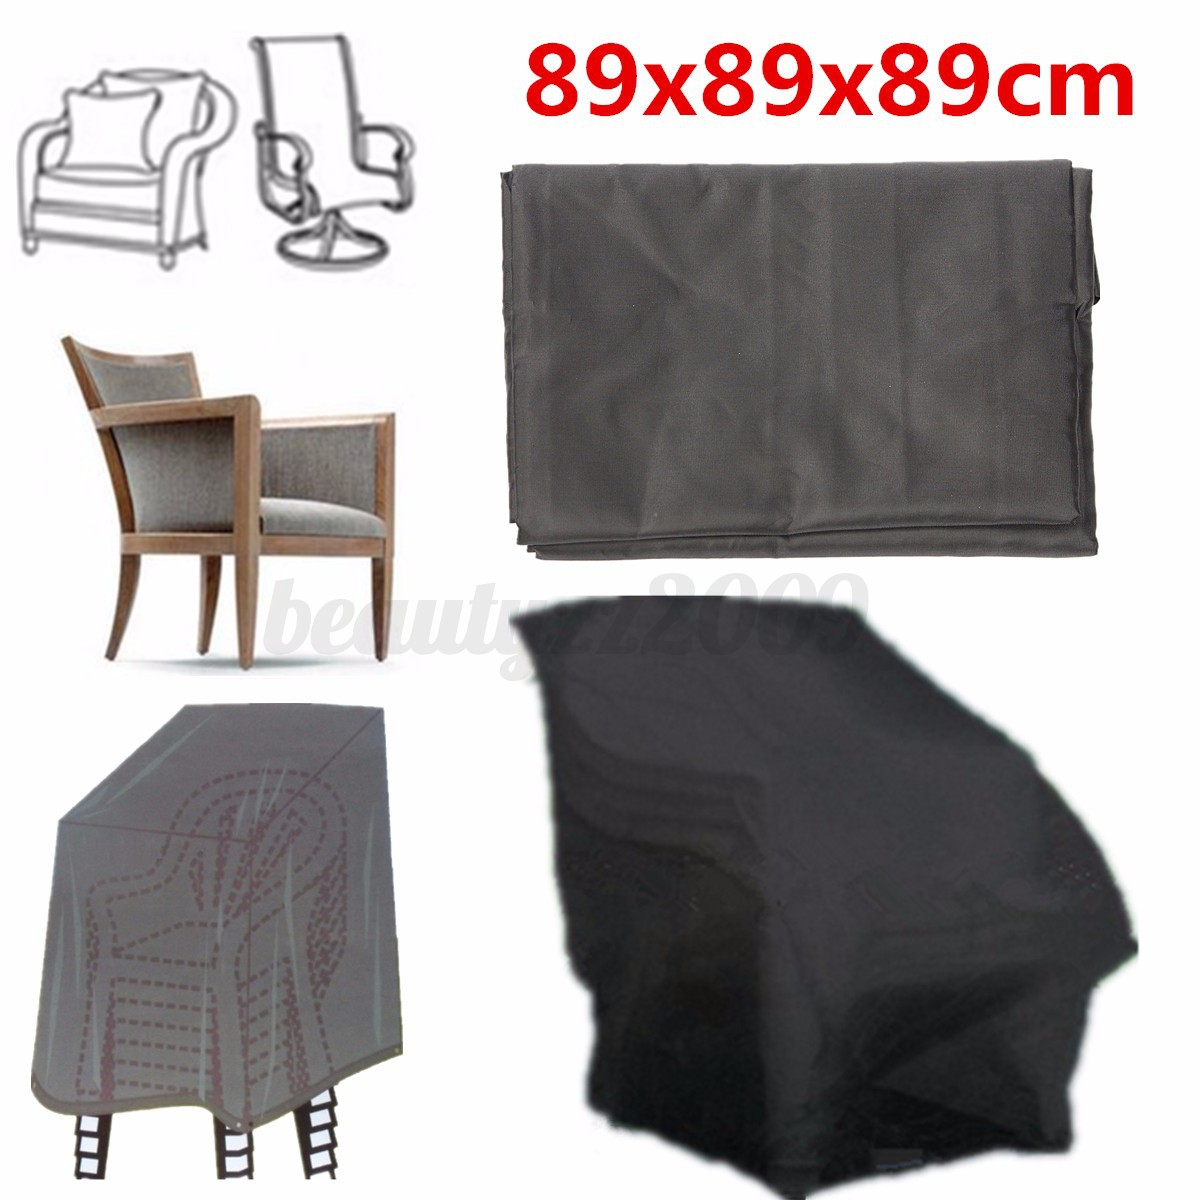 Waterproof Chair Cover For Outdoor Garden Patio Furniture